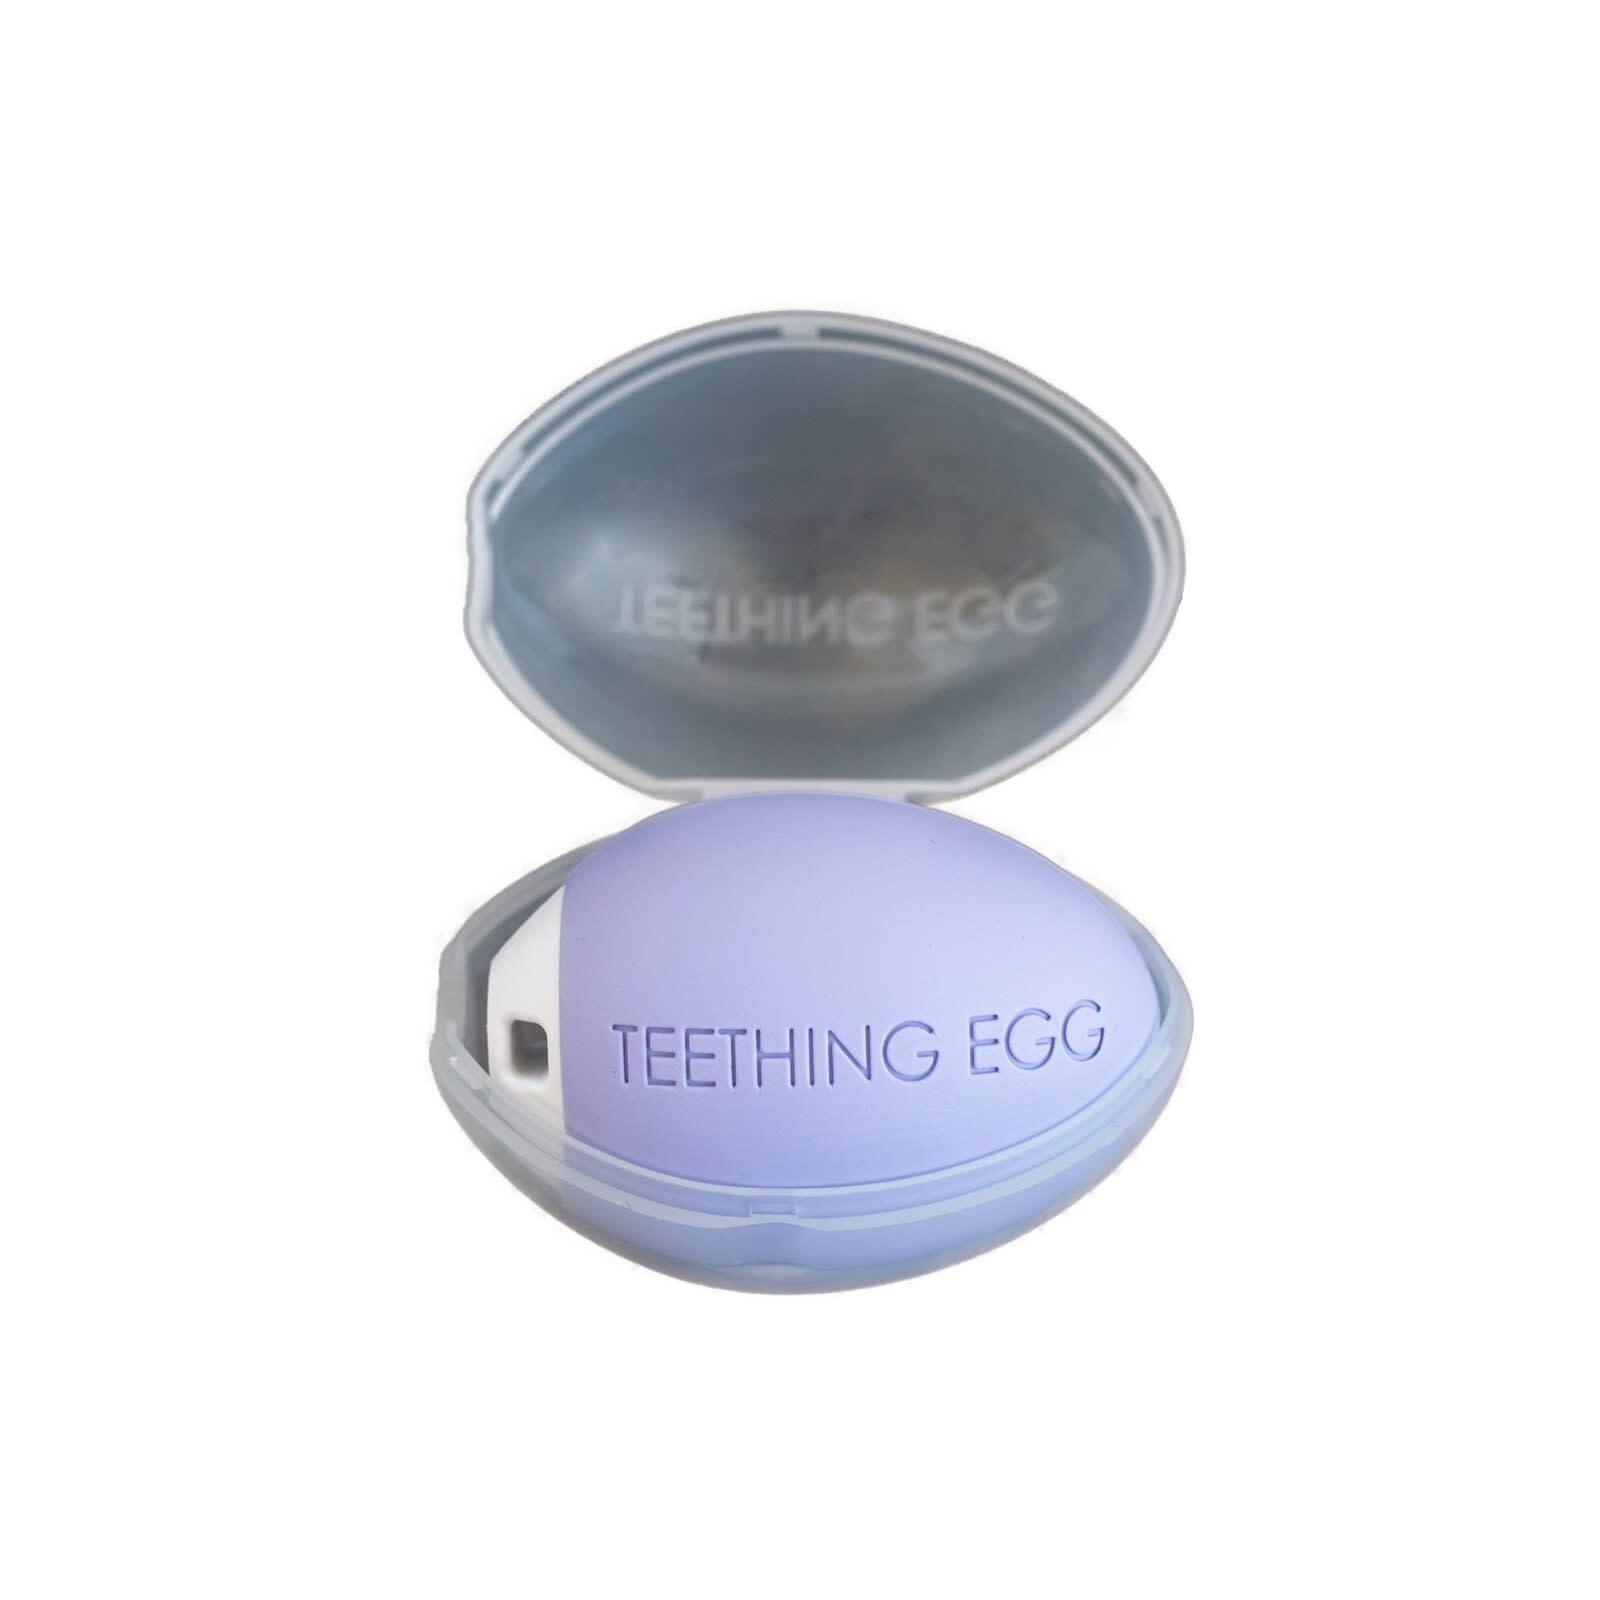 The Teething Egg The Teething Egg Shell